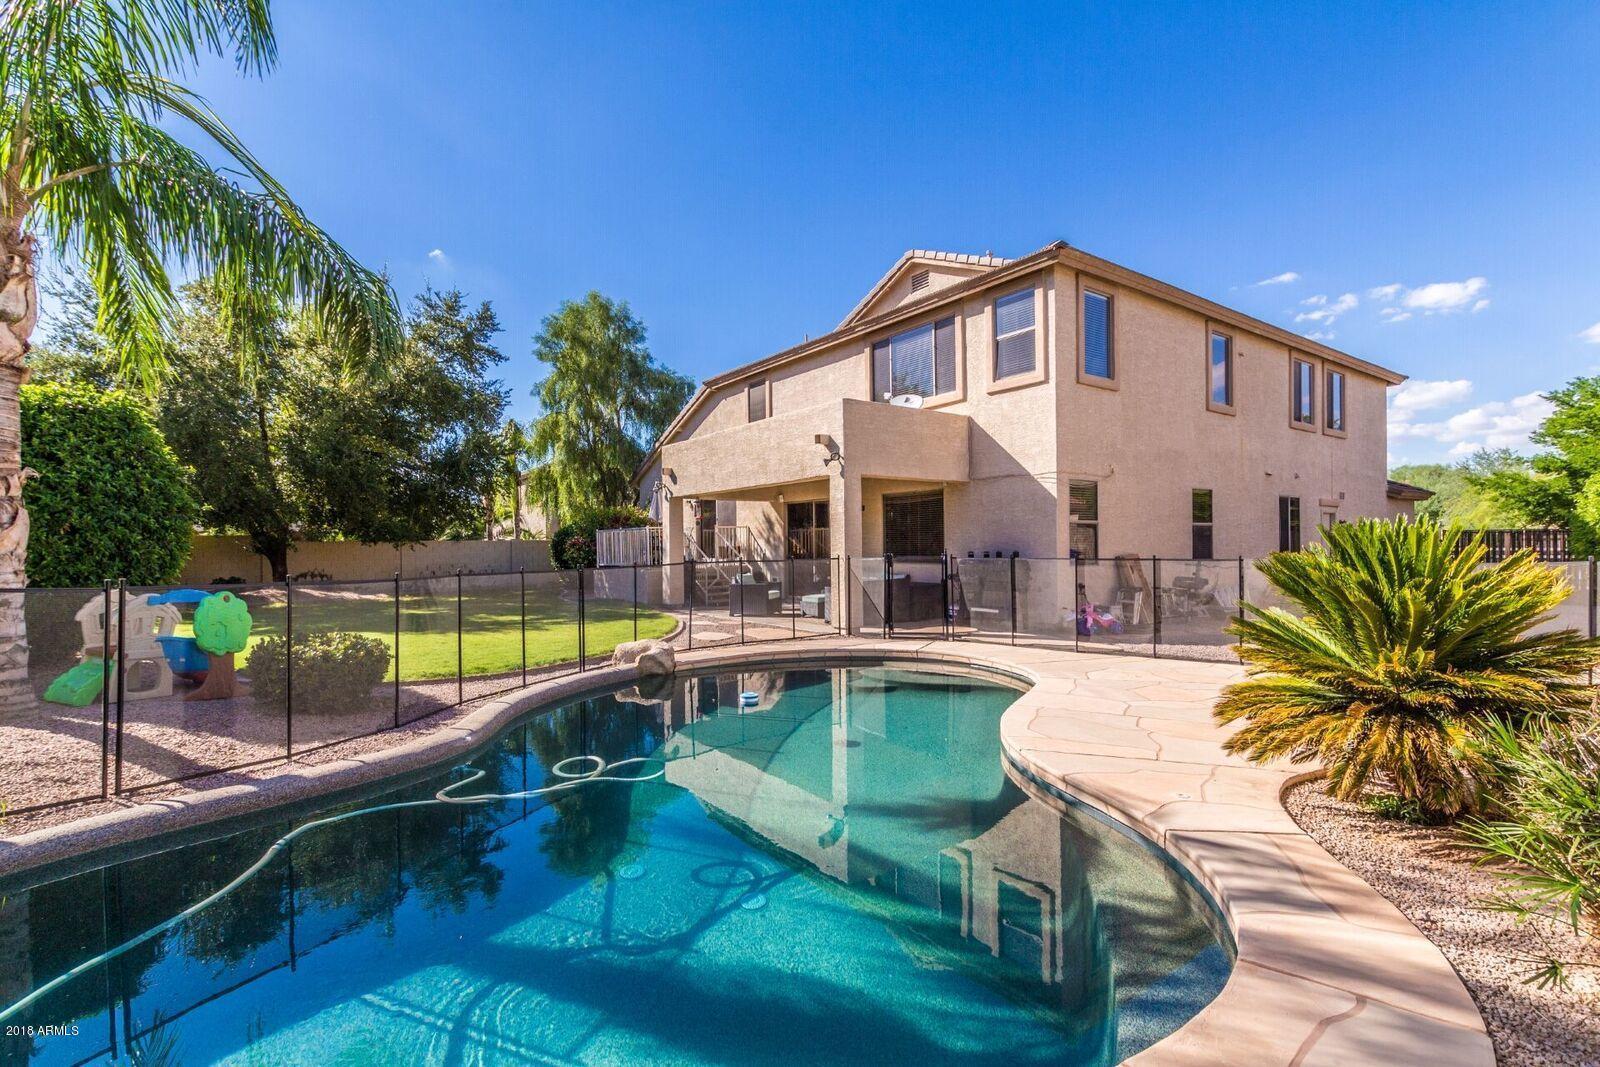 MLS 5828678 2651 E DESERT INN Drive, Chandler, AZ 85249 Condos